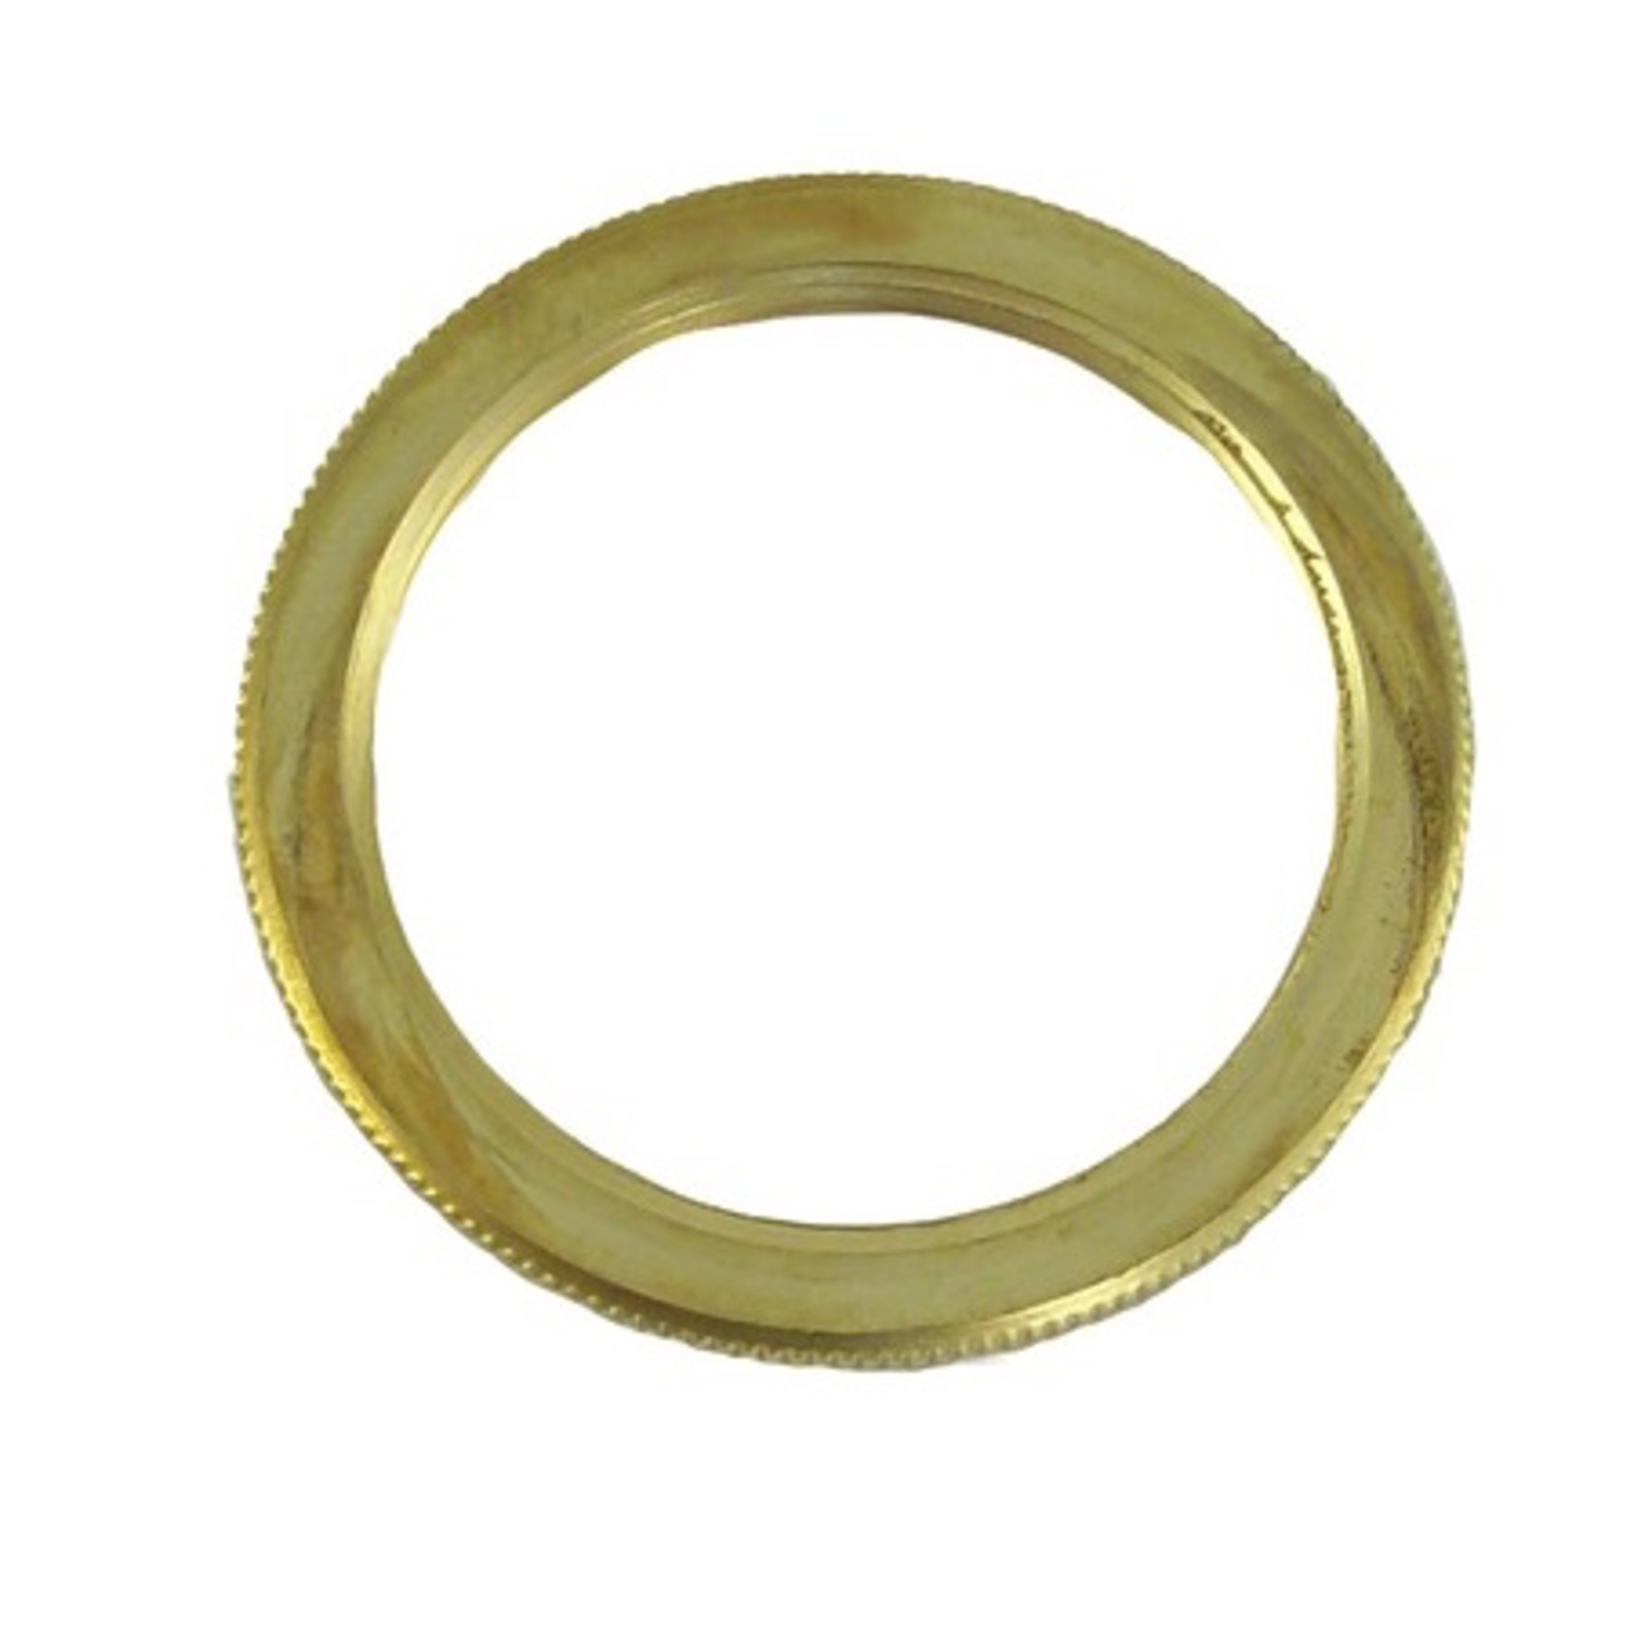 SL British Made Extra Brass Shade Ring